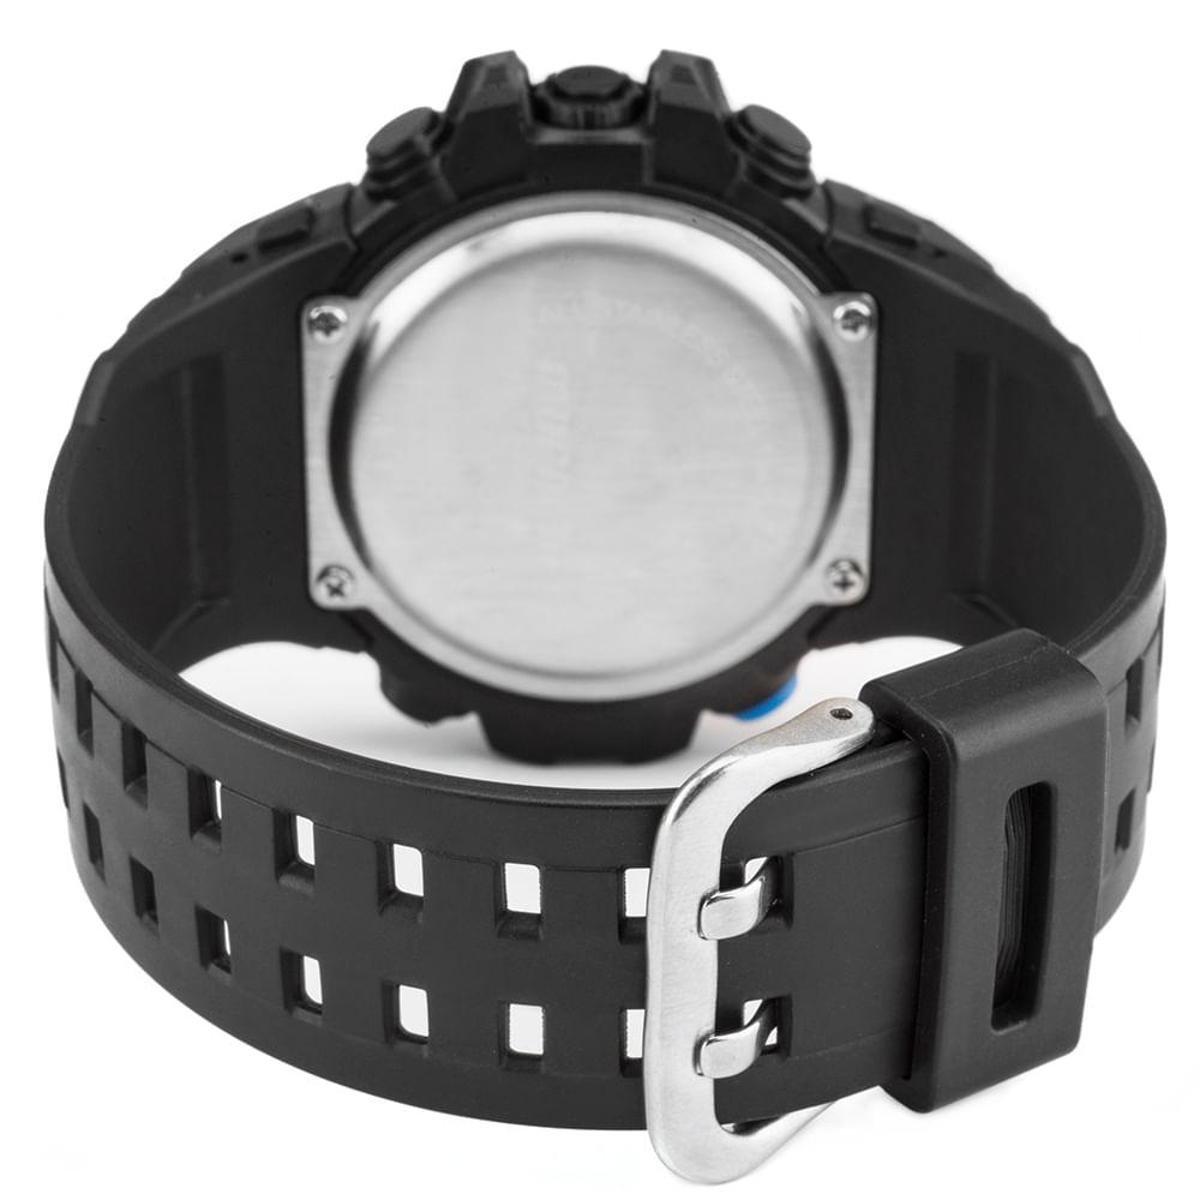 Relógio Mormaii Masculino Wave - MO9451 8A MO9451 8A - Preto ... 0a55463e6f